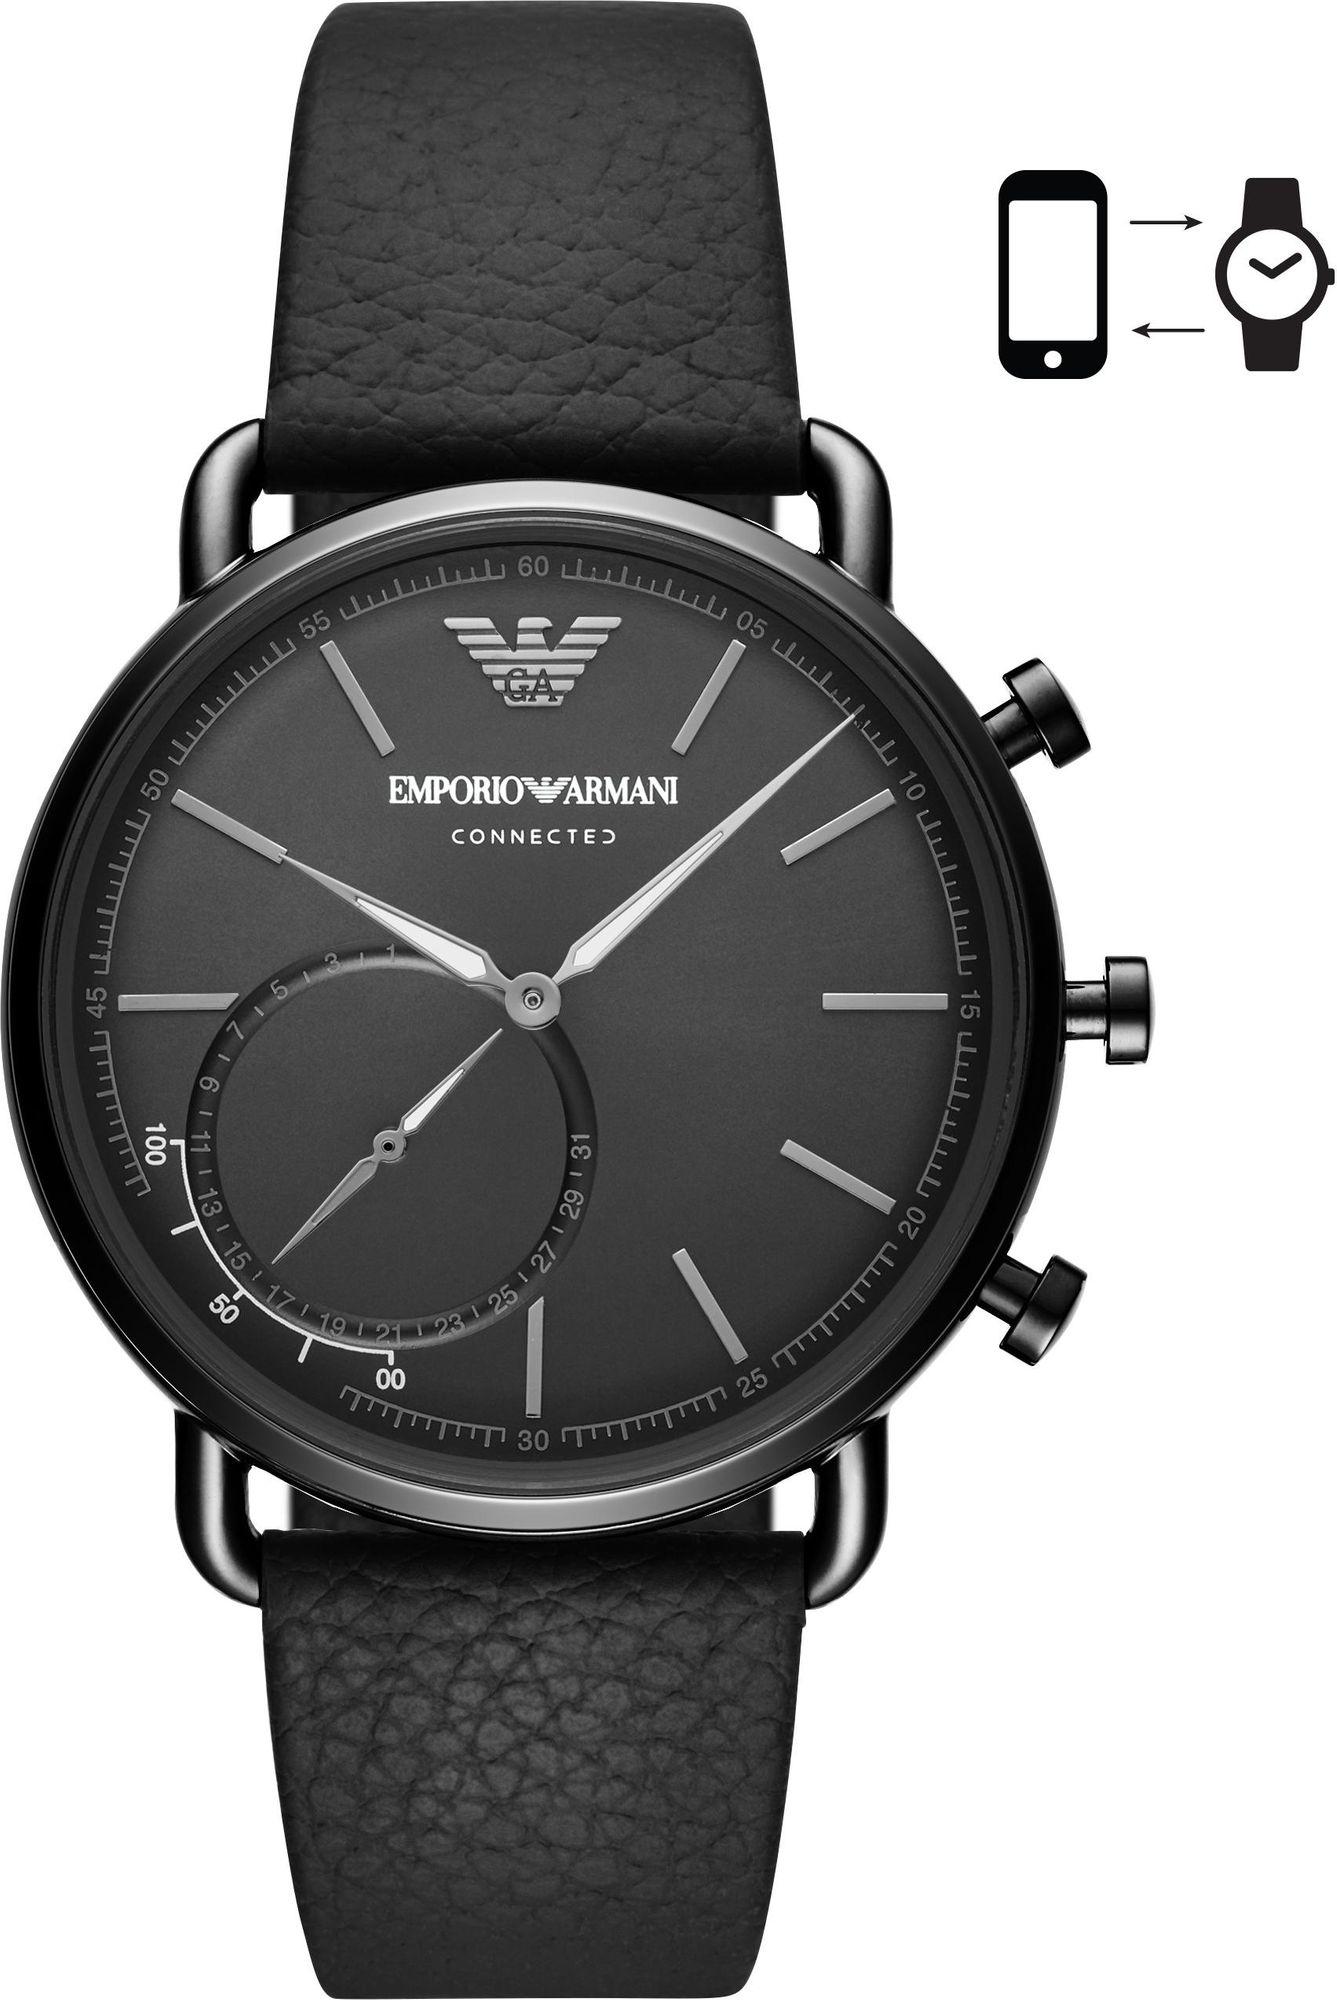 Armani Connected AVIATOR ART3030 Smartwatch